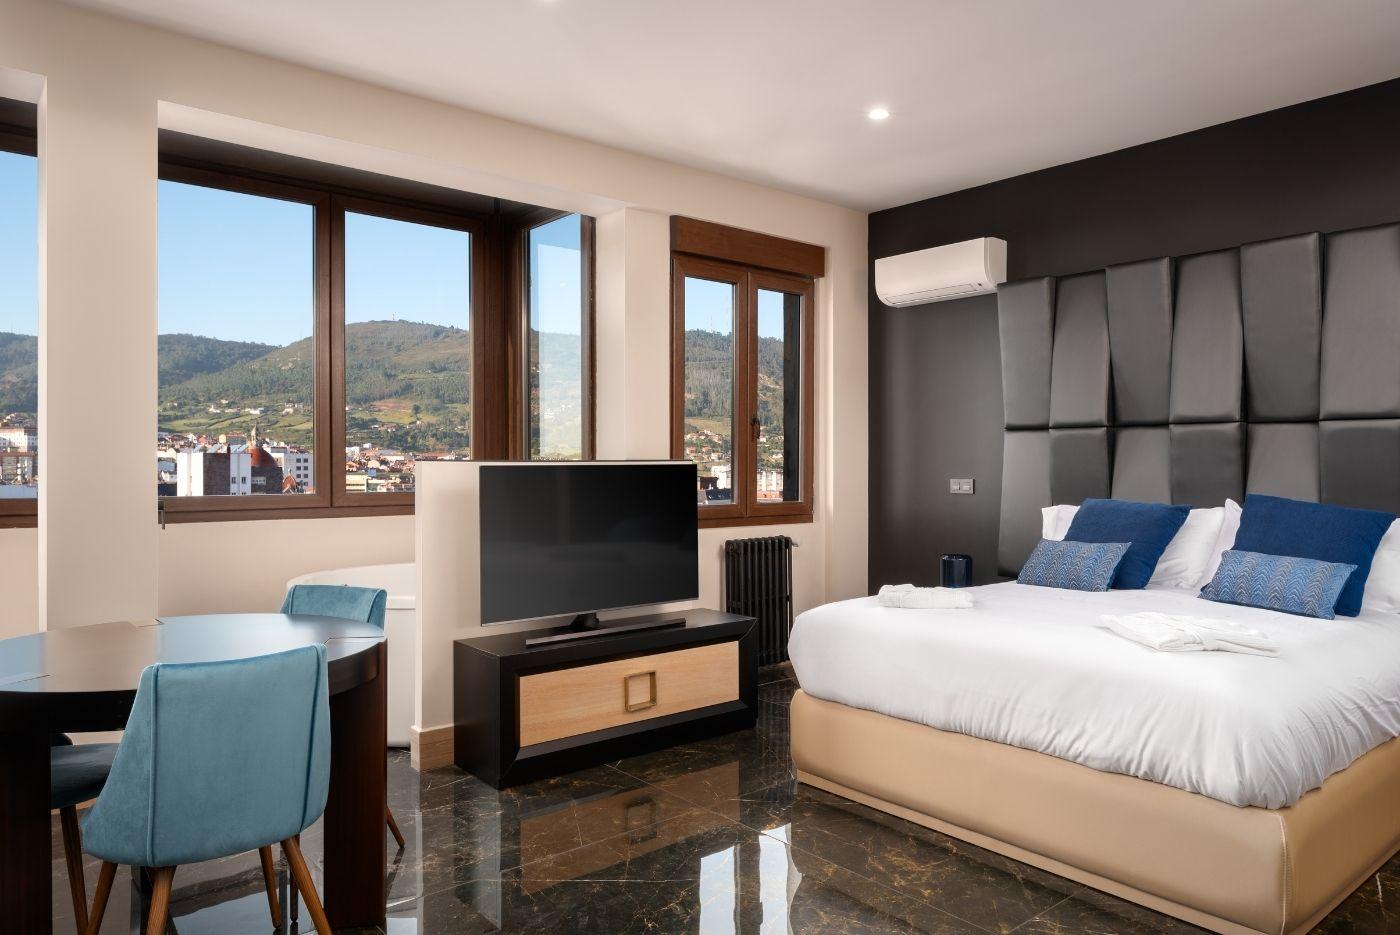 Apartamento-Suite-Deluxe-71-Oviedo-1907-02